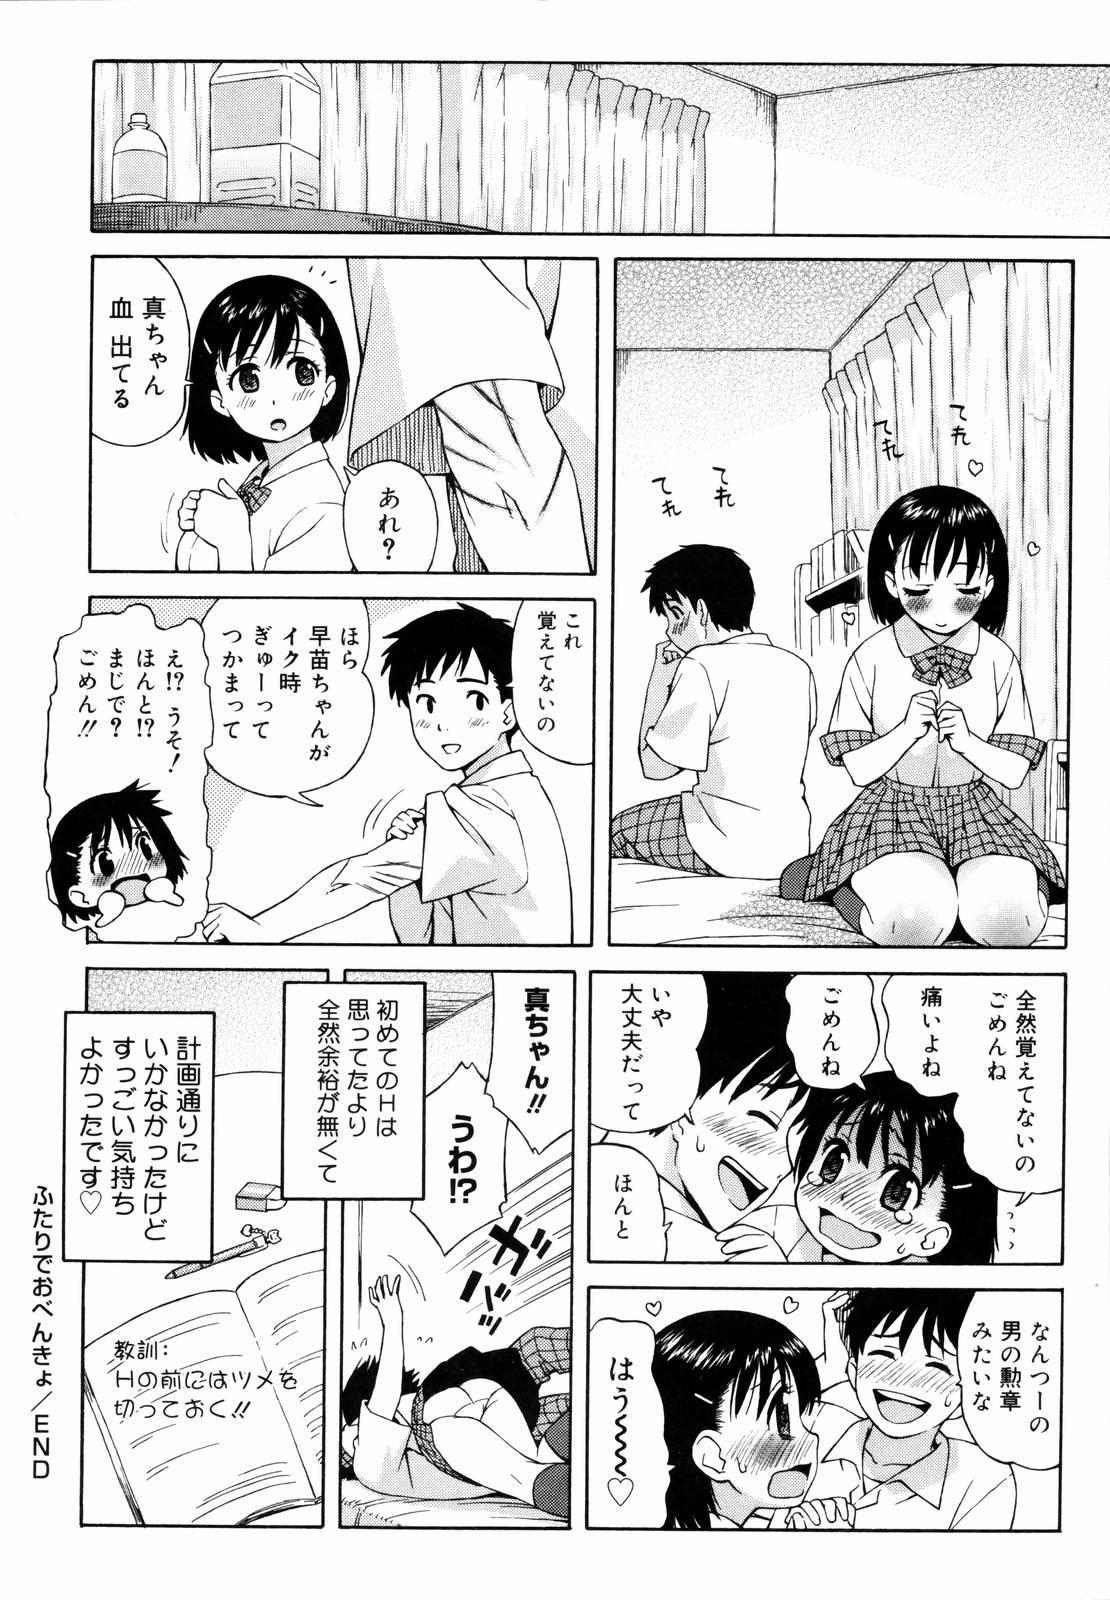 Shishunki wa Hatsujouki - Adolescence is a sexual excitement period. 63